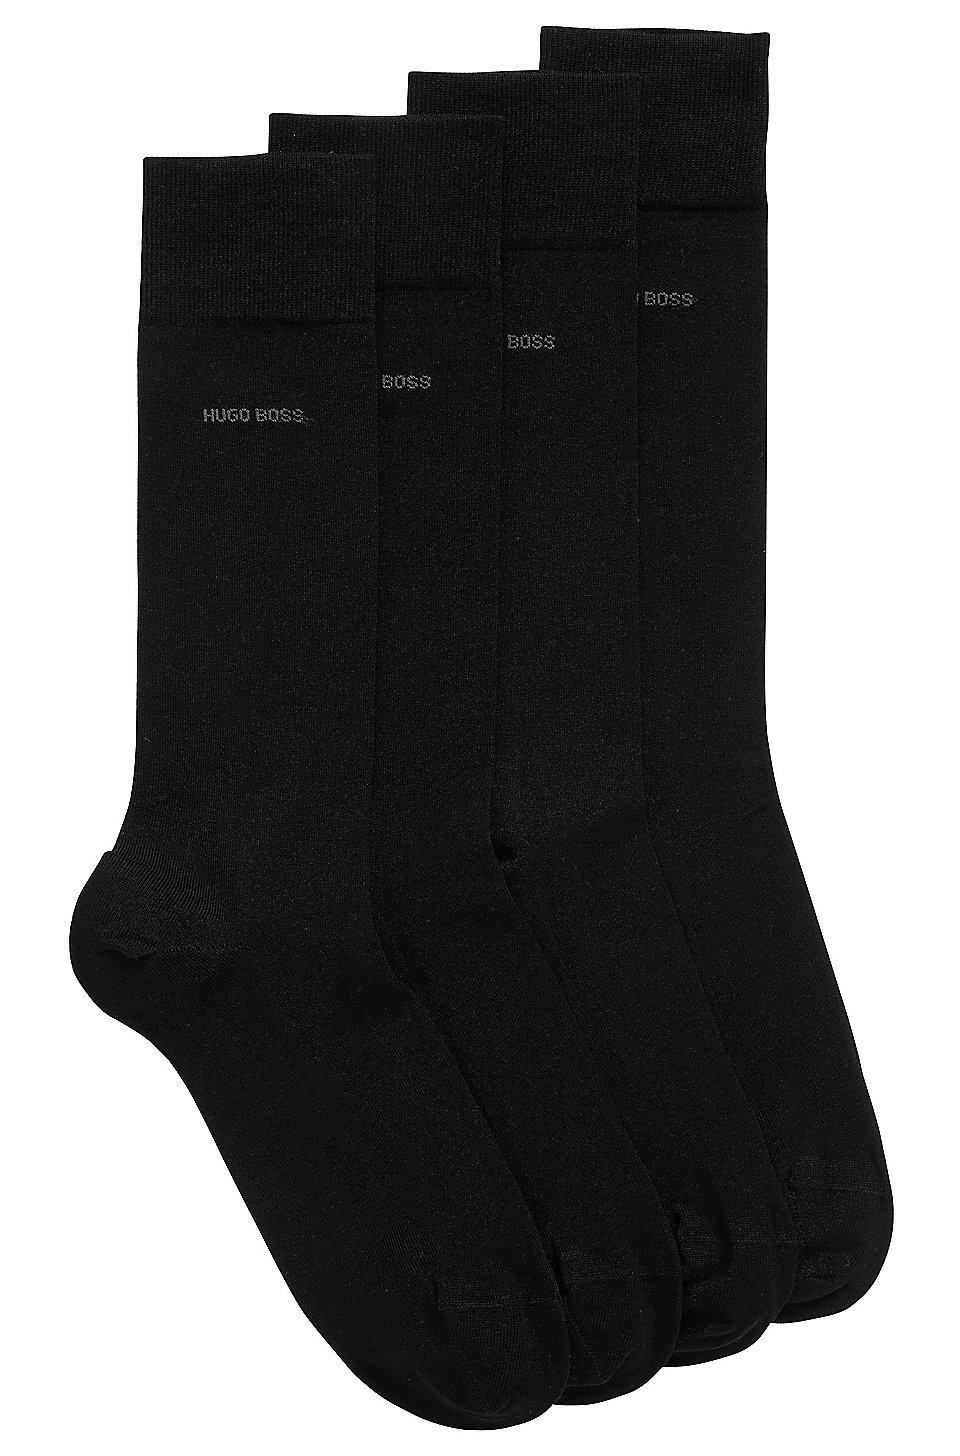 BOSS Mens George Kh Uni Mc Knee-High Socks